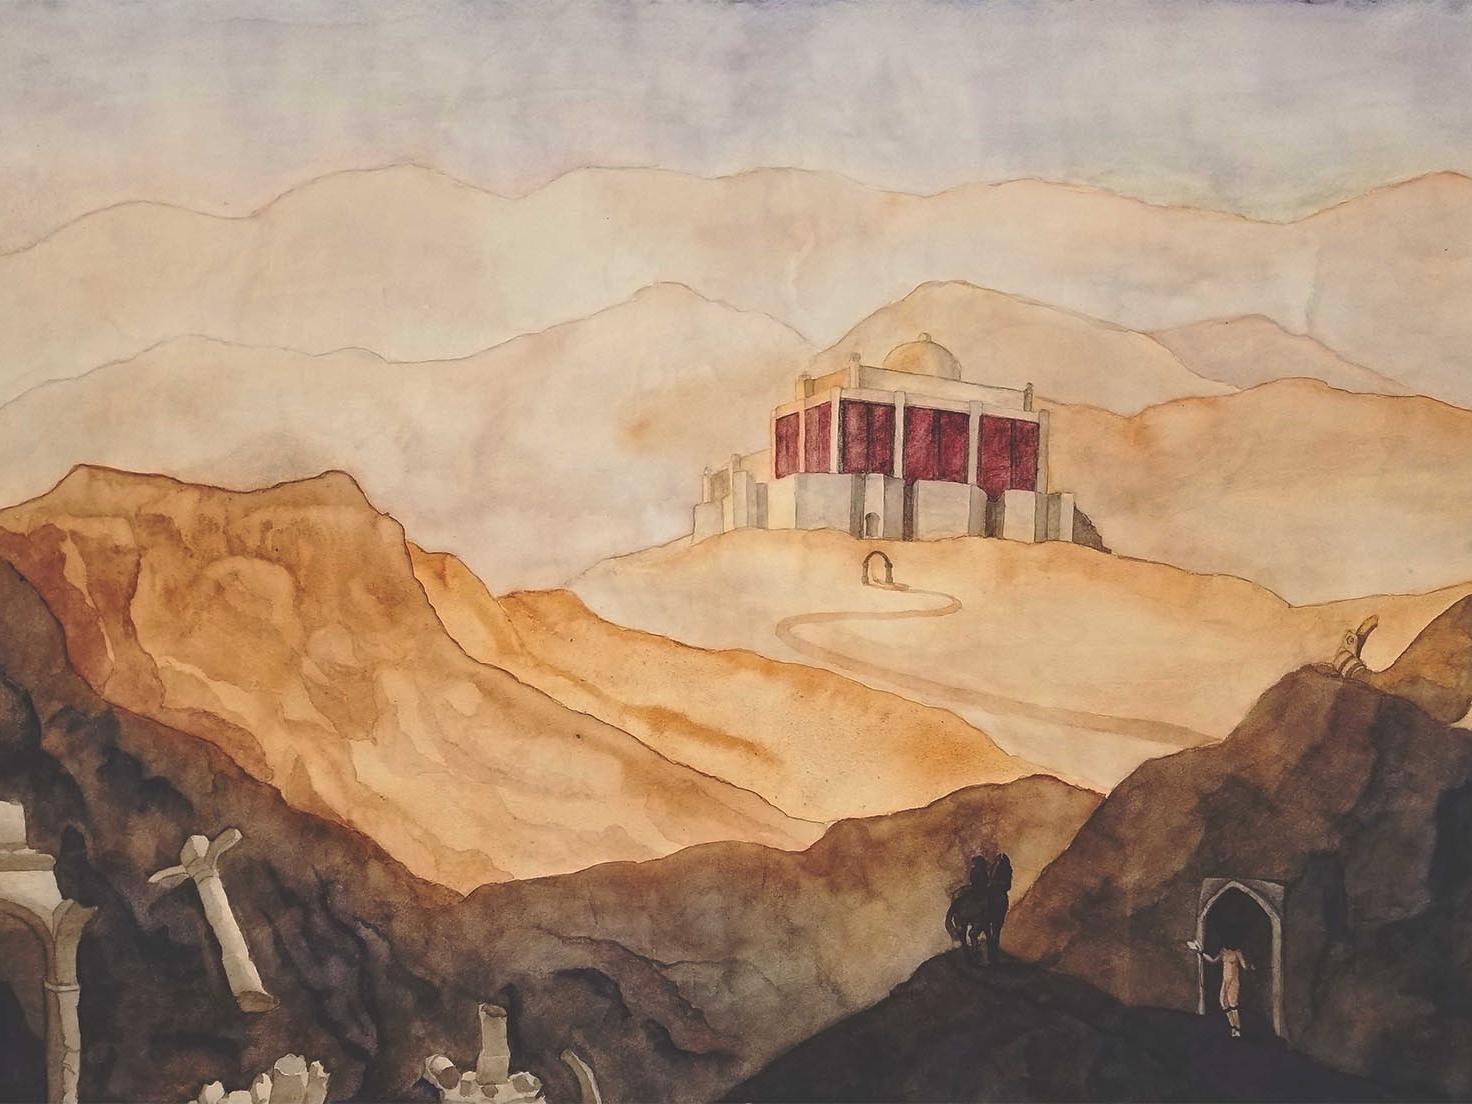 The Great Desert City warm colors landscape illustration landscape watercolor art watercolor painting book art desert illustration